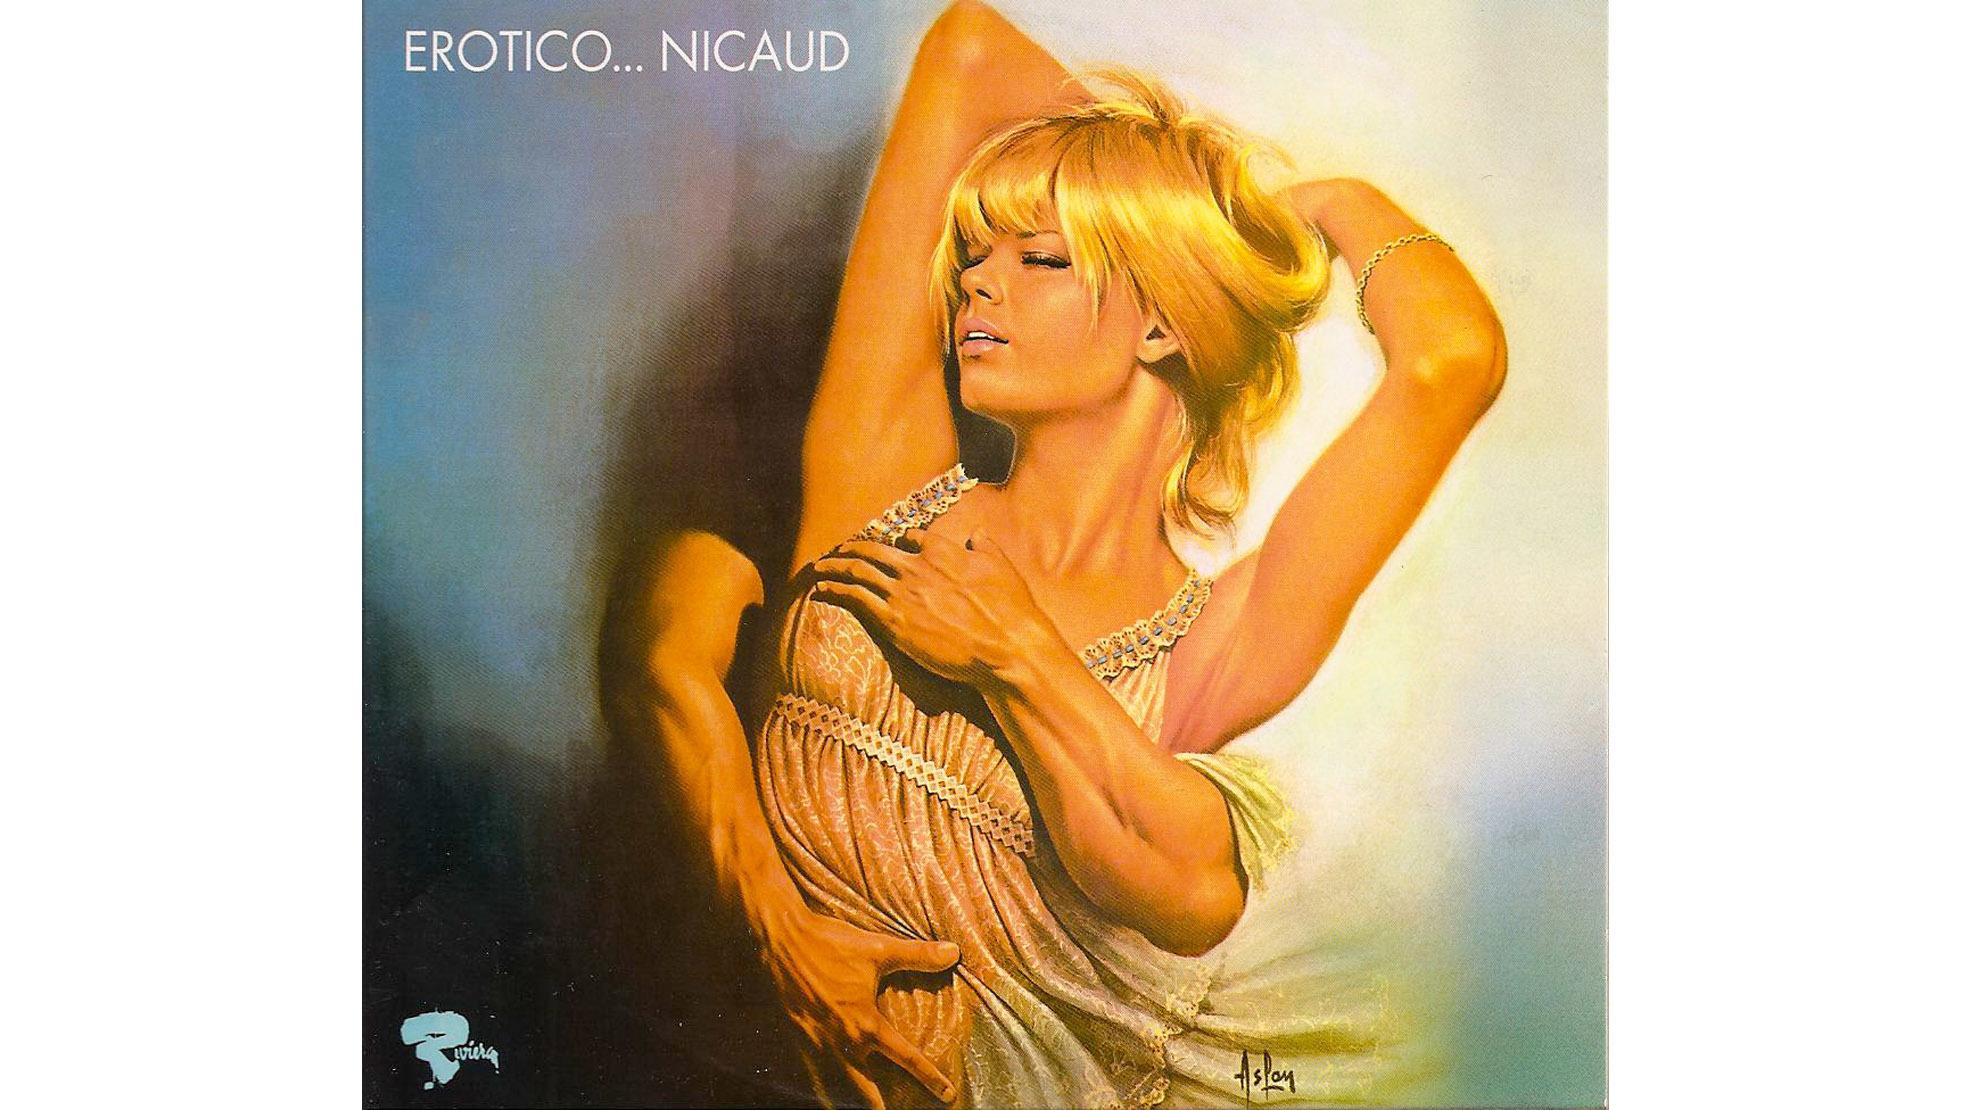 Nicaud • Erotico... Nicaud (1970)